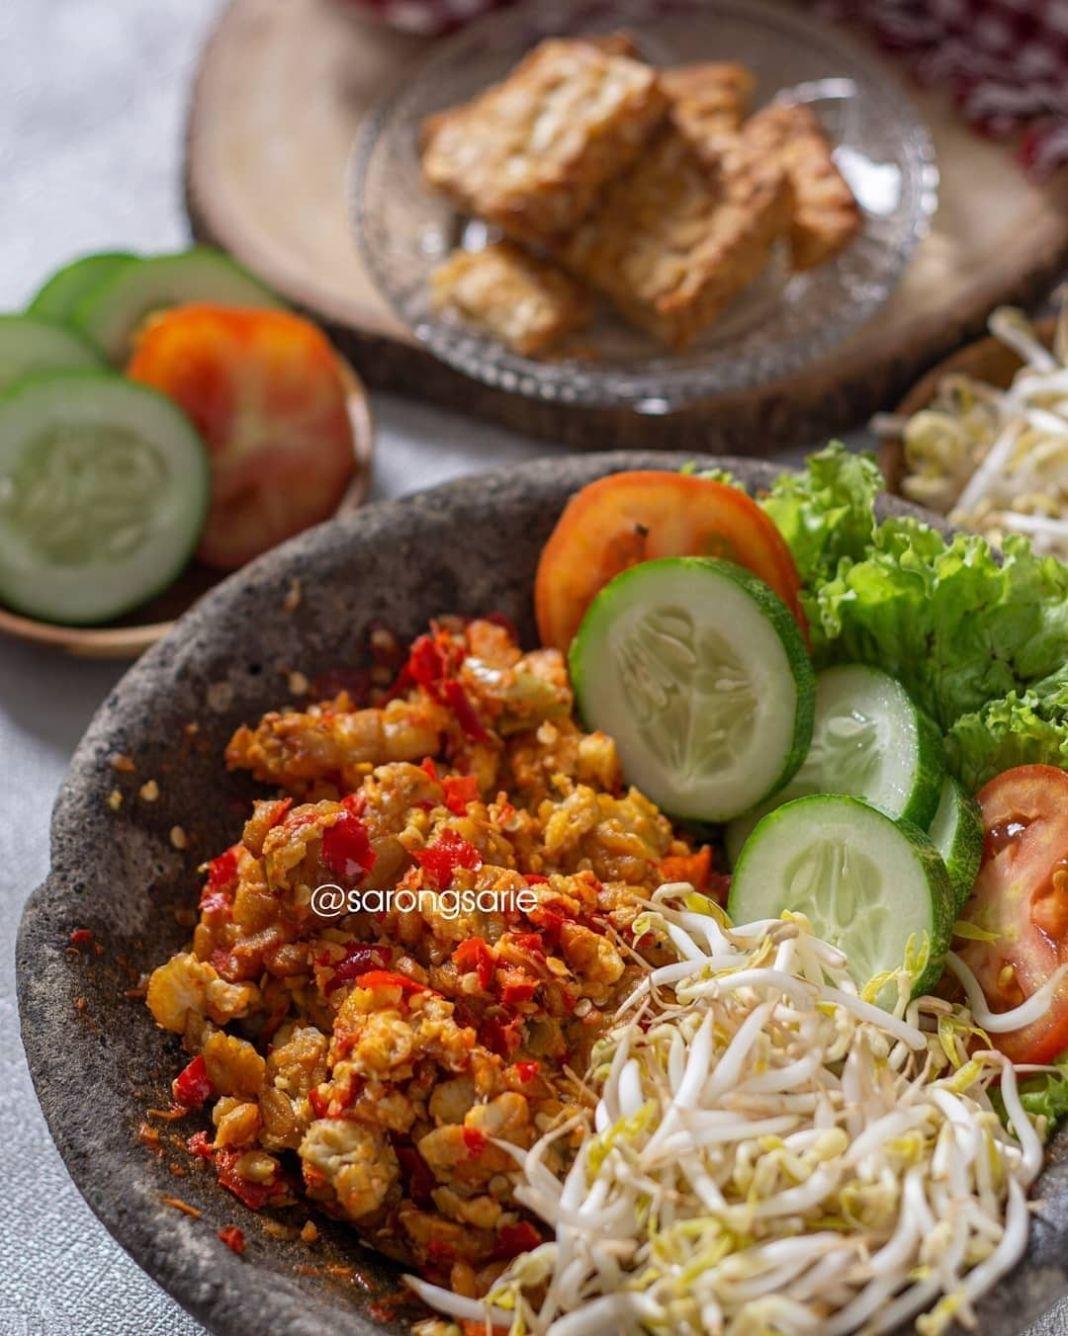 Info kuliner, Sambel Tempe Gampang banget buatnya serta enak, inspirasi masak tempe  Bahan: – 1 papan tempe, po…